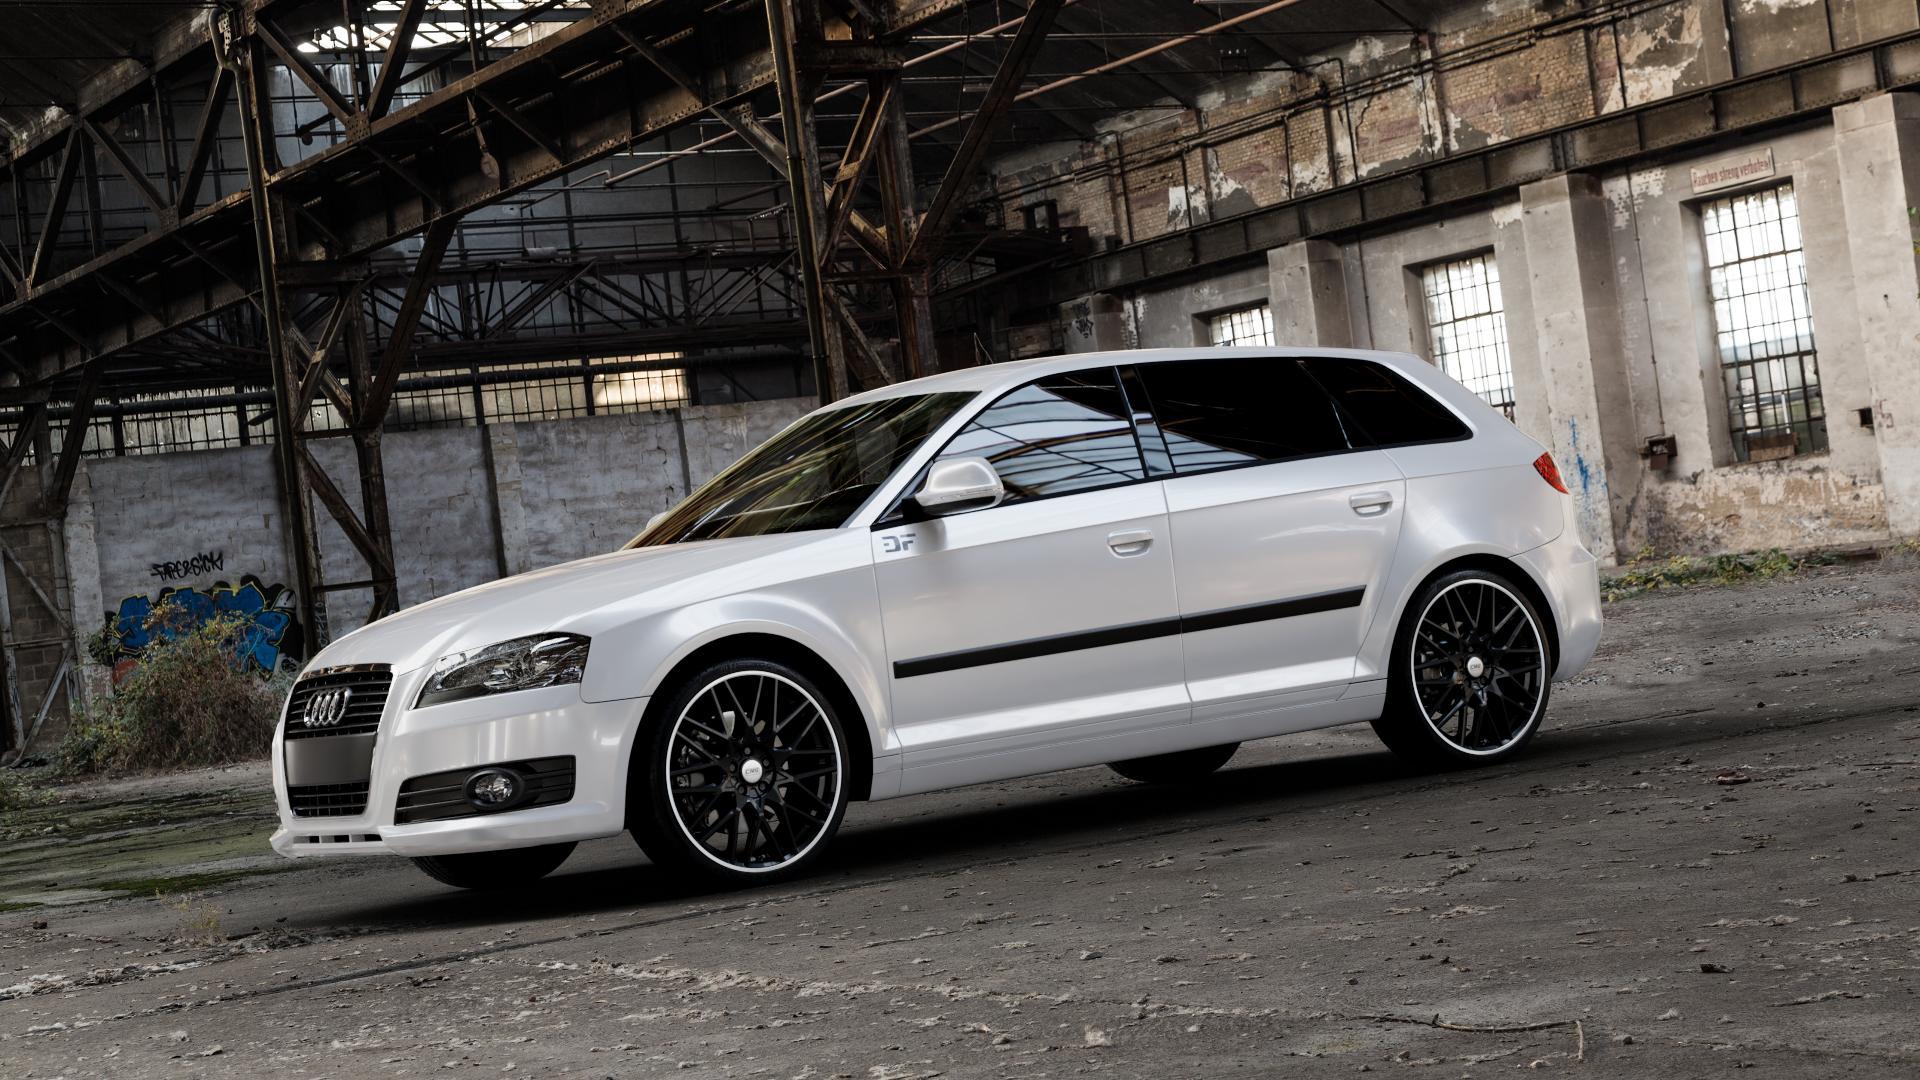 CMS C25 Diamond Rim Black Felge mit Reifen grau schwarz in 19Zoll Winterfelge Alufelge auf weissem Audi A3 Typ 8P (Sportback) 1,6l 75kW (102 PS) 2,0l FSI 110kW (150 1,9l TDI 77kW (105 103kW (140 TFSI 147kW (200 85kW (116 100kW (136 1,8l 118kW (160 125kW (170 1,4l 92kW (125 120kW (163 quattro 3,2l V6 184kW (250 S3 195kW (265 1,2l 66kW (90 18